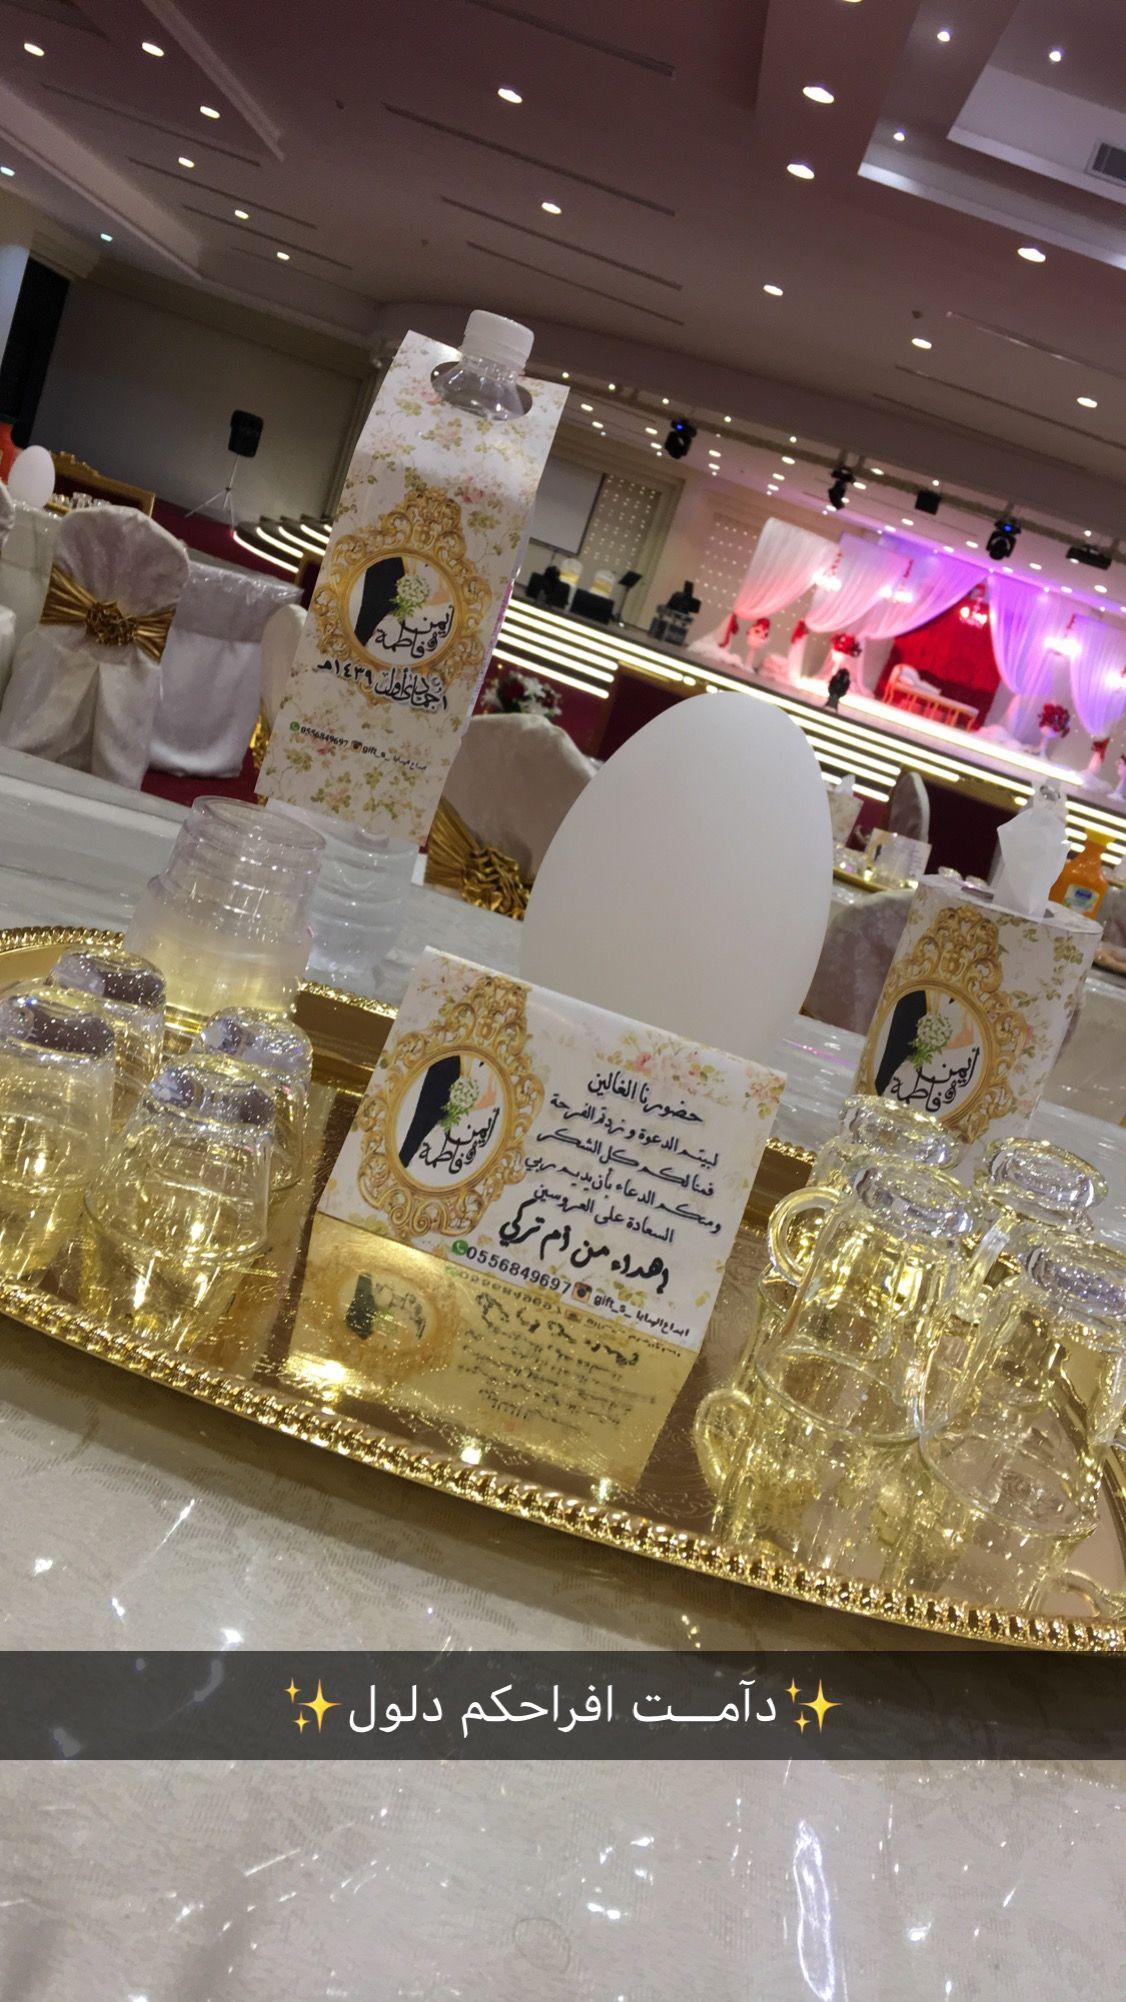 Pin By نور اسكاي On جماليات Table Decorations Decor Home Decor